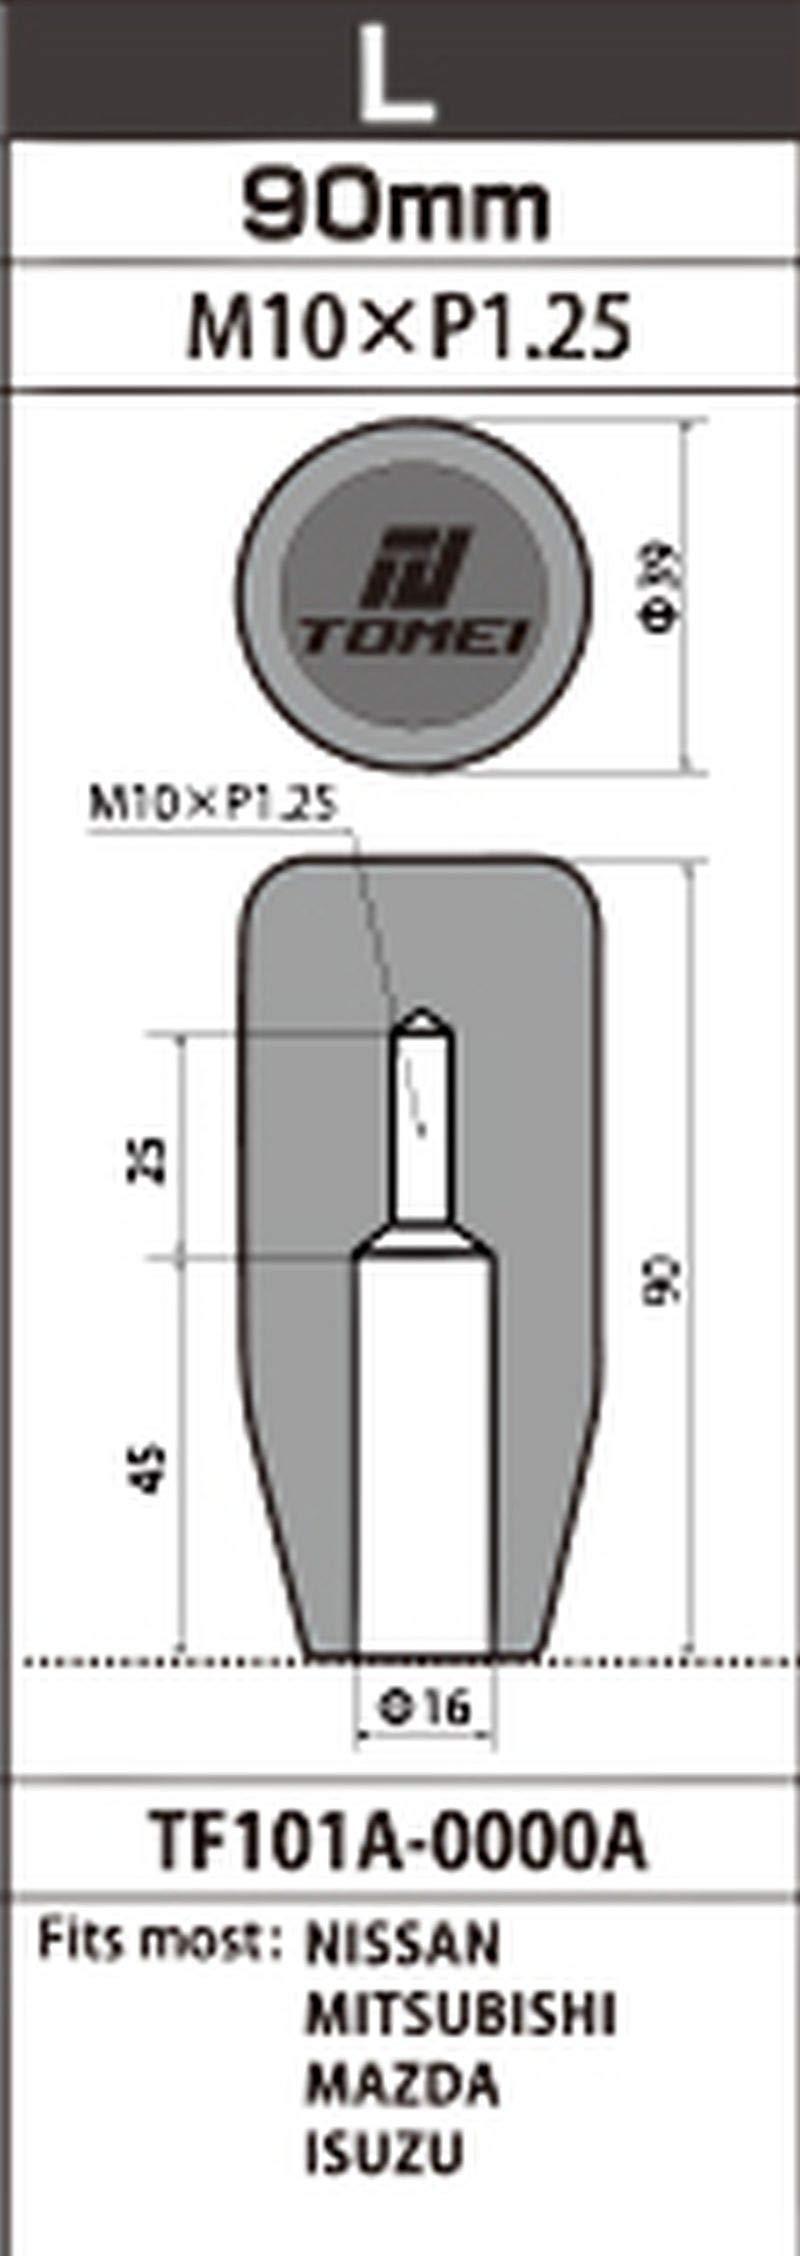 Tomei Shift Knob Long 90mm